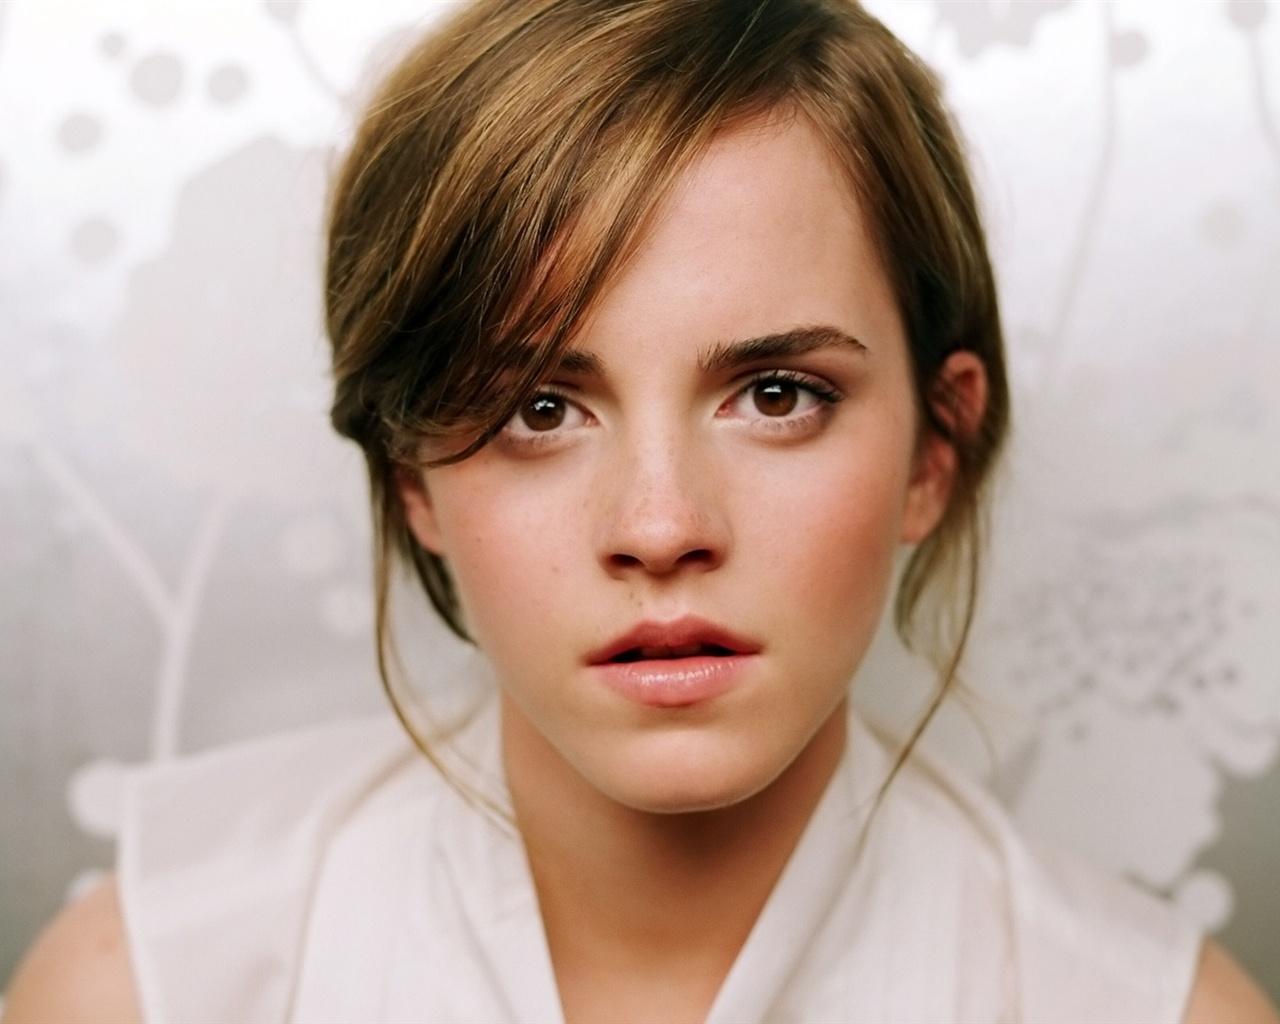 Emma-Watson-19_1280x1024.jpg Emma Watson